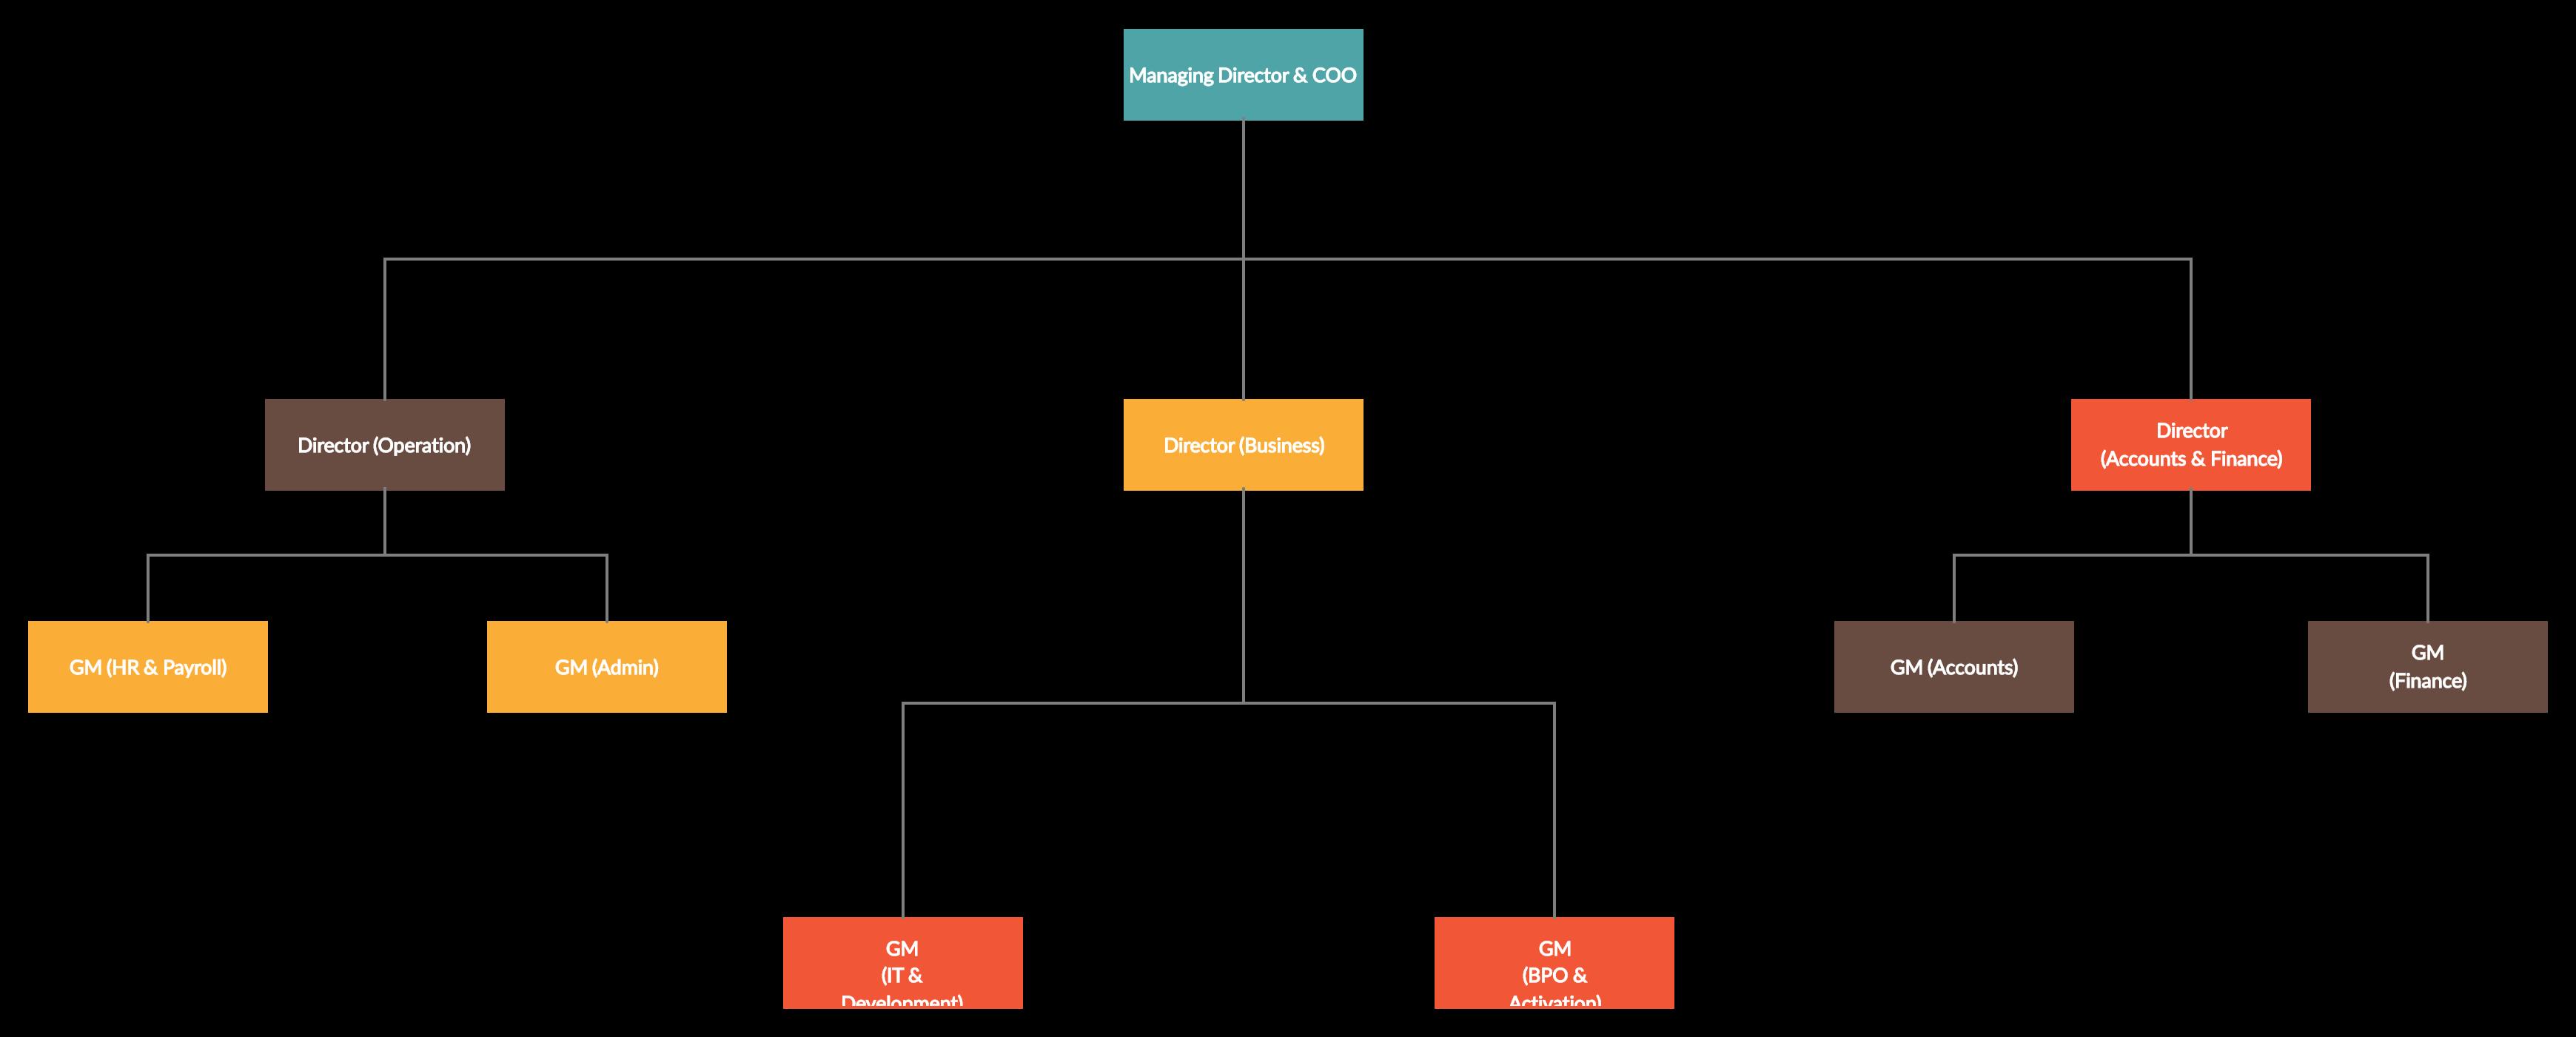 Demo Start Organogram Org Chart Chart